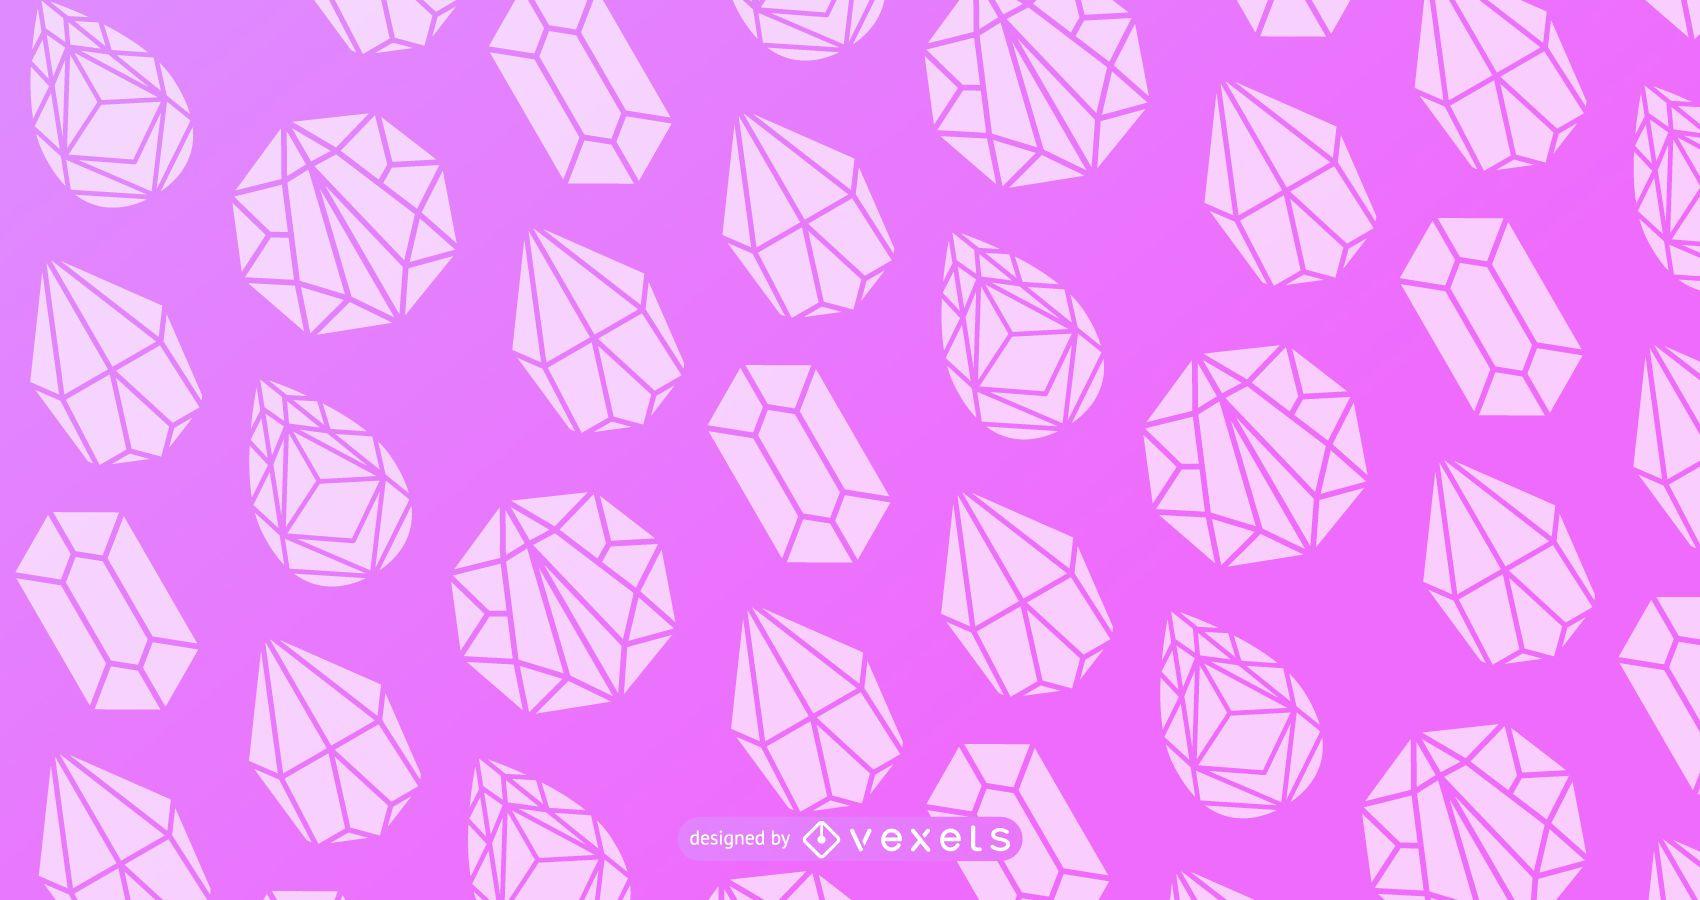 Diseño de patrón de silueta de cristal